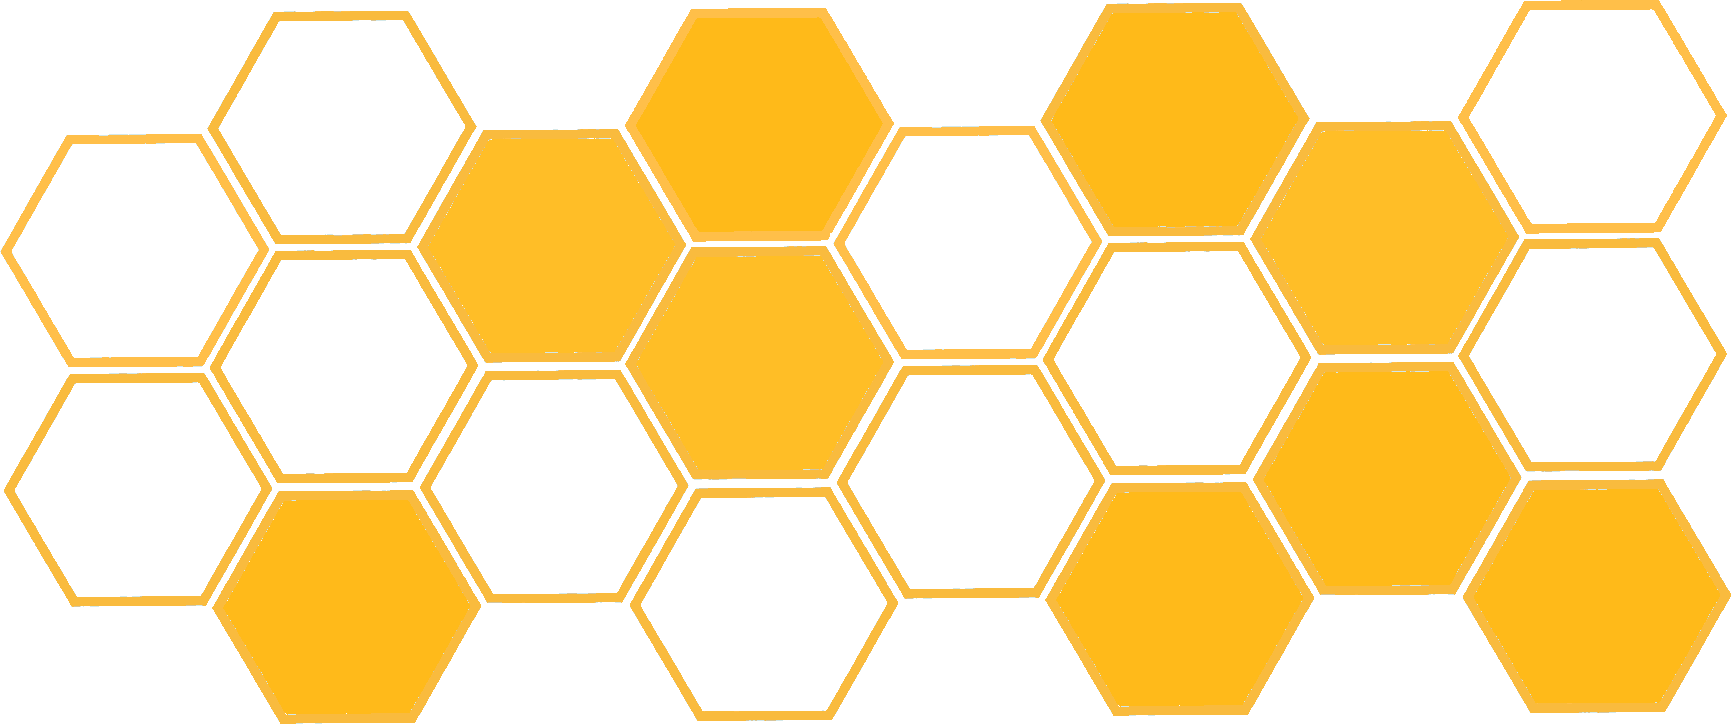 mobile navigation honeycomb decoration